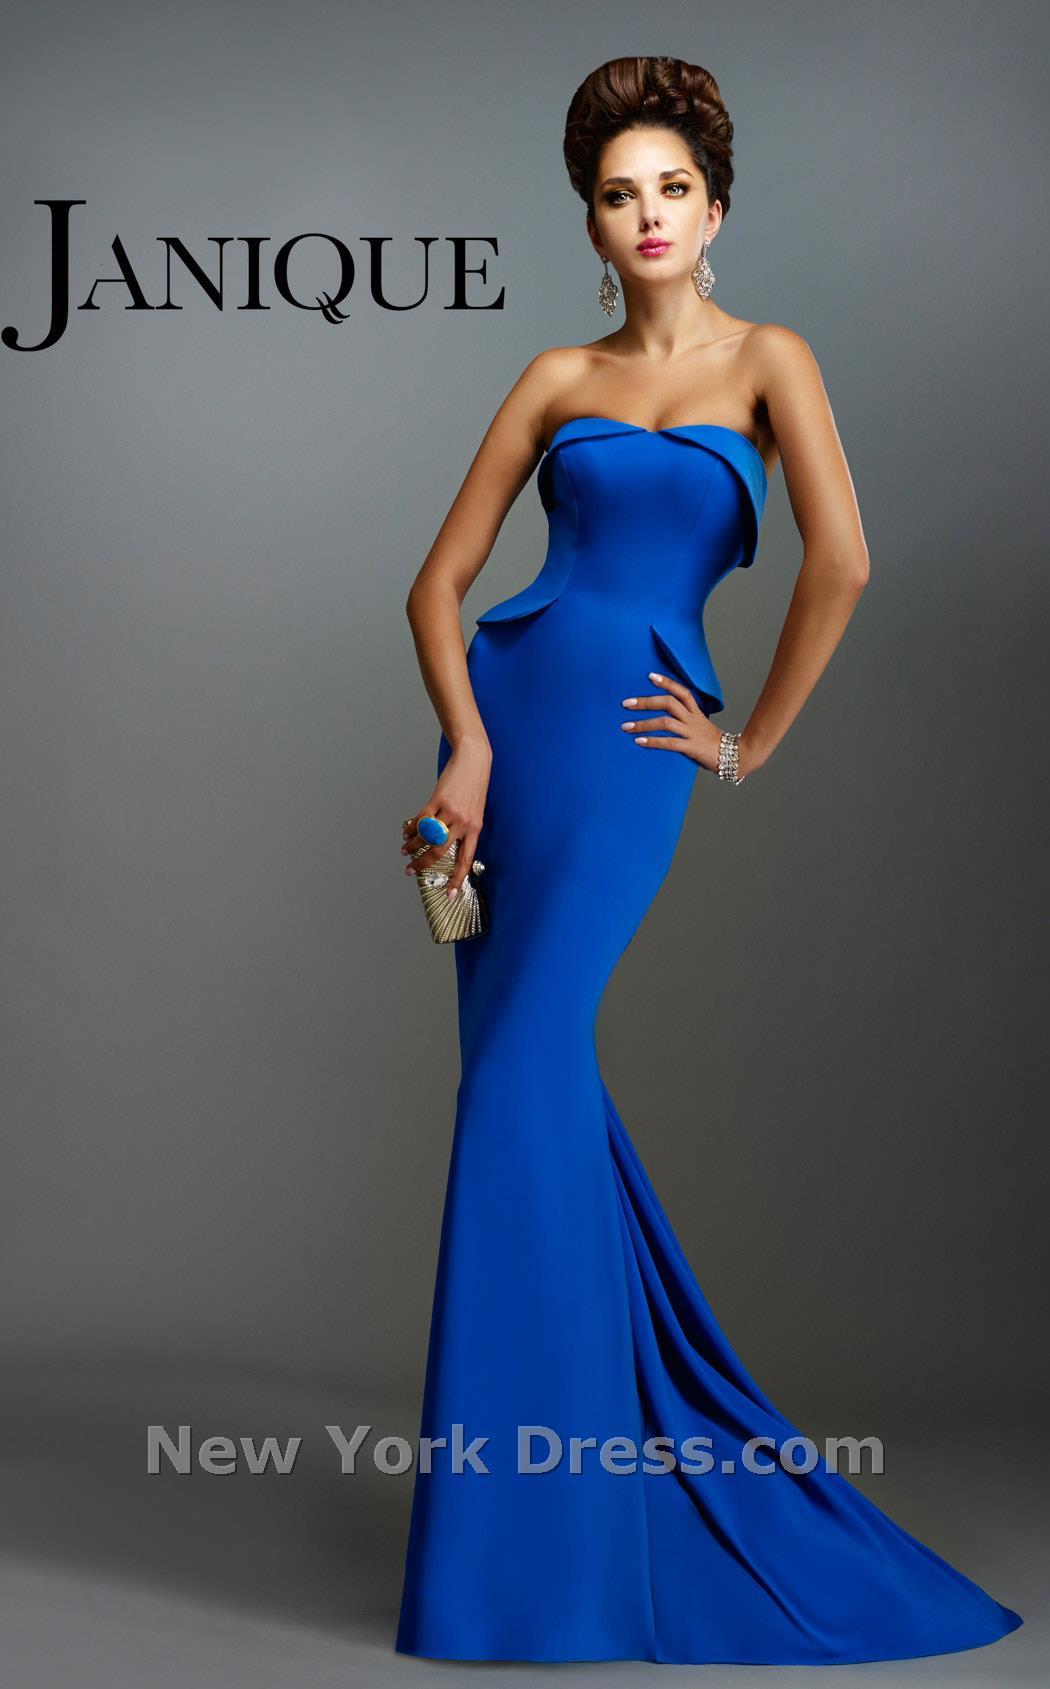 New york dress evening dresses